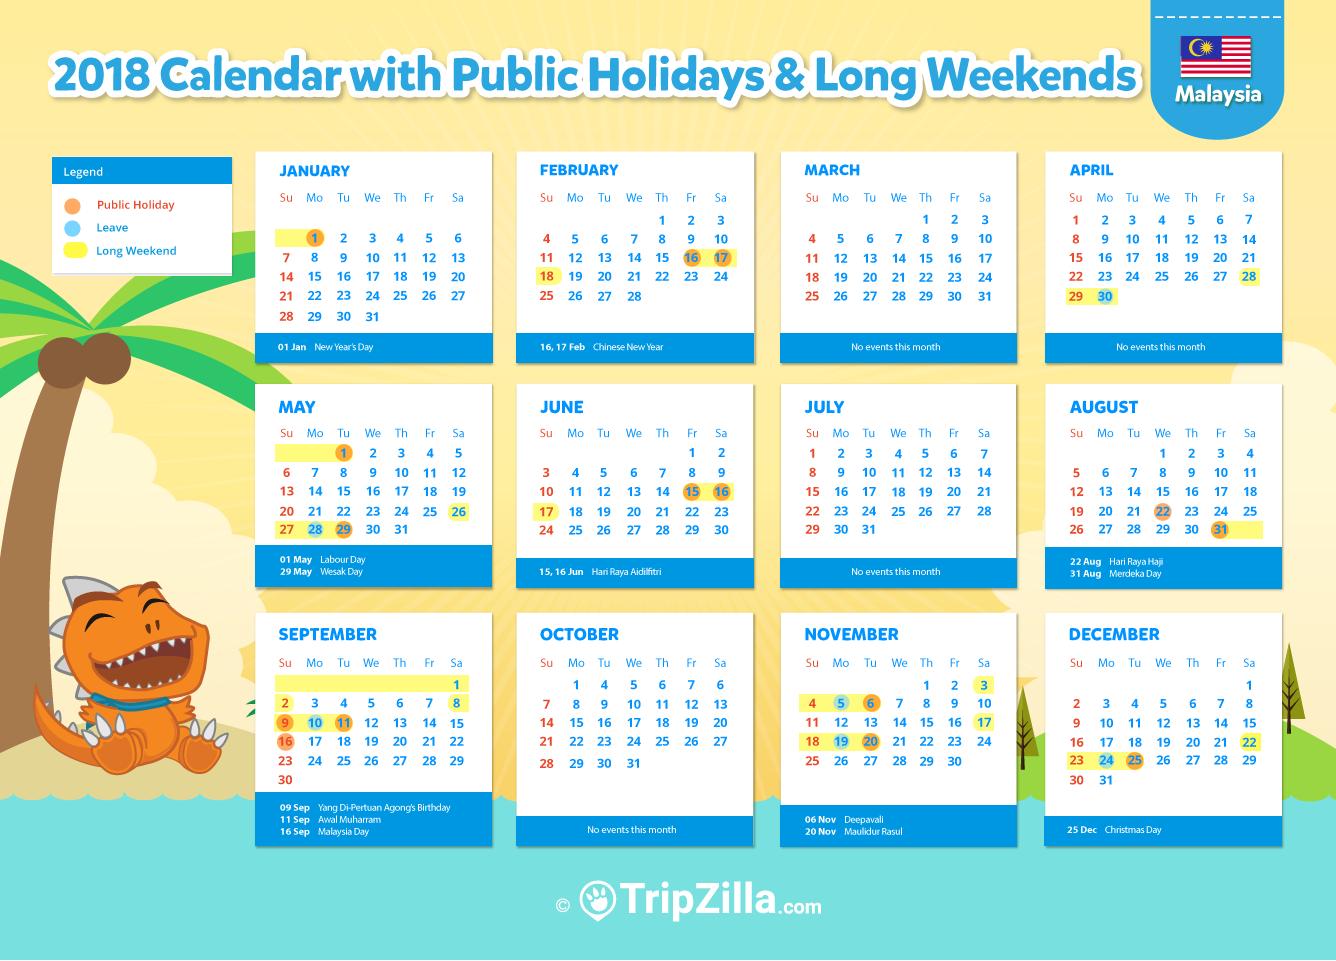 10 Long Weekends In Malaysia In 2018